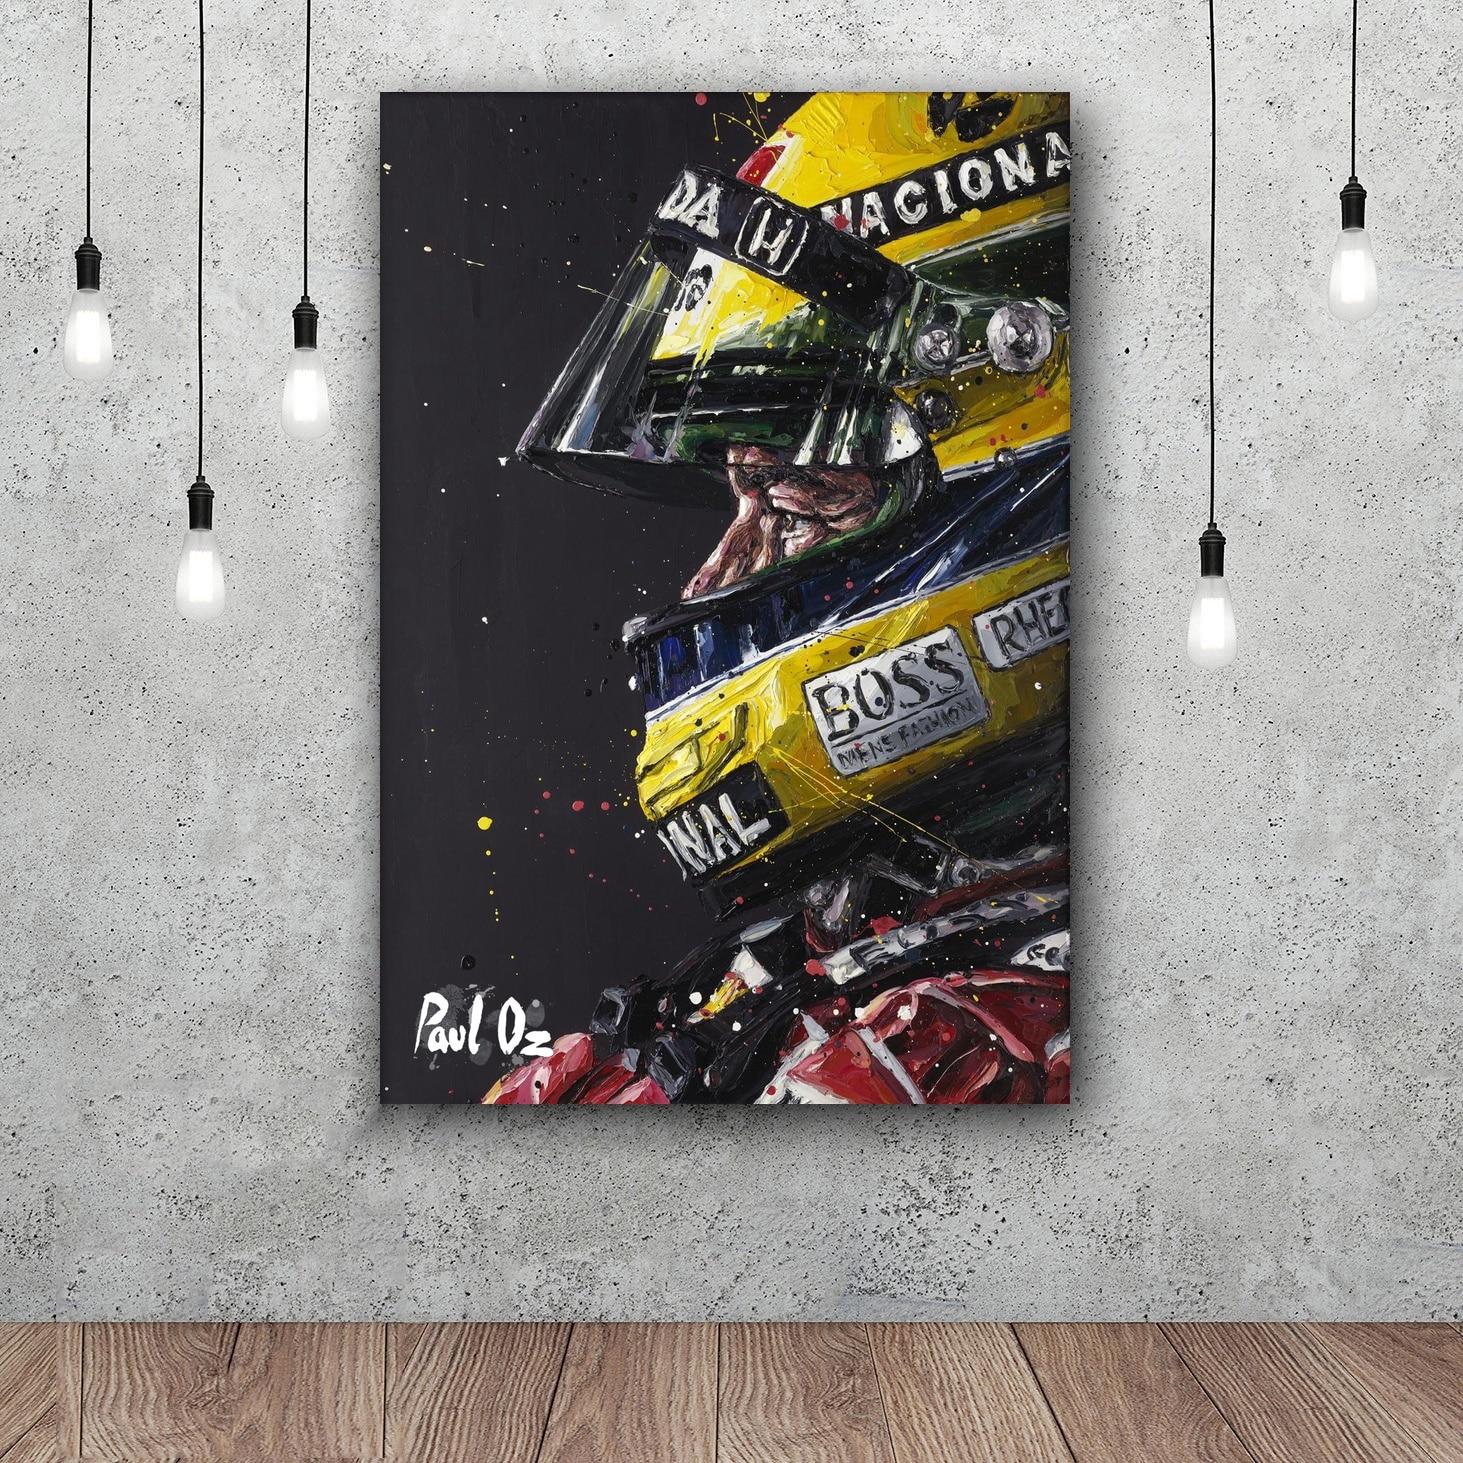 ayrton-font-b-senna-b-font-da-silva-f1-racer-at-the-disco-art-silk-fabric-poster-wall-decor-12x18-24x36inch